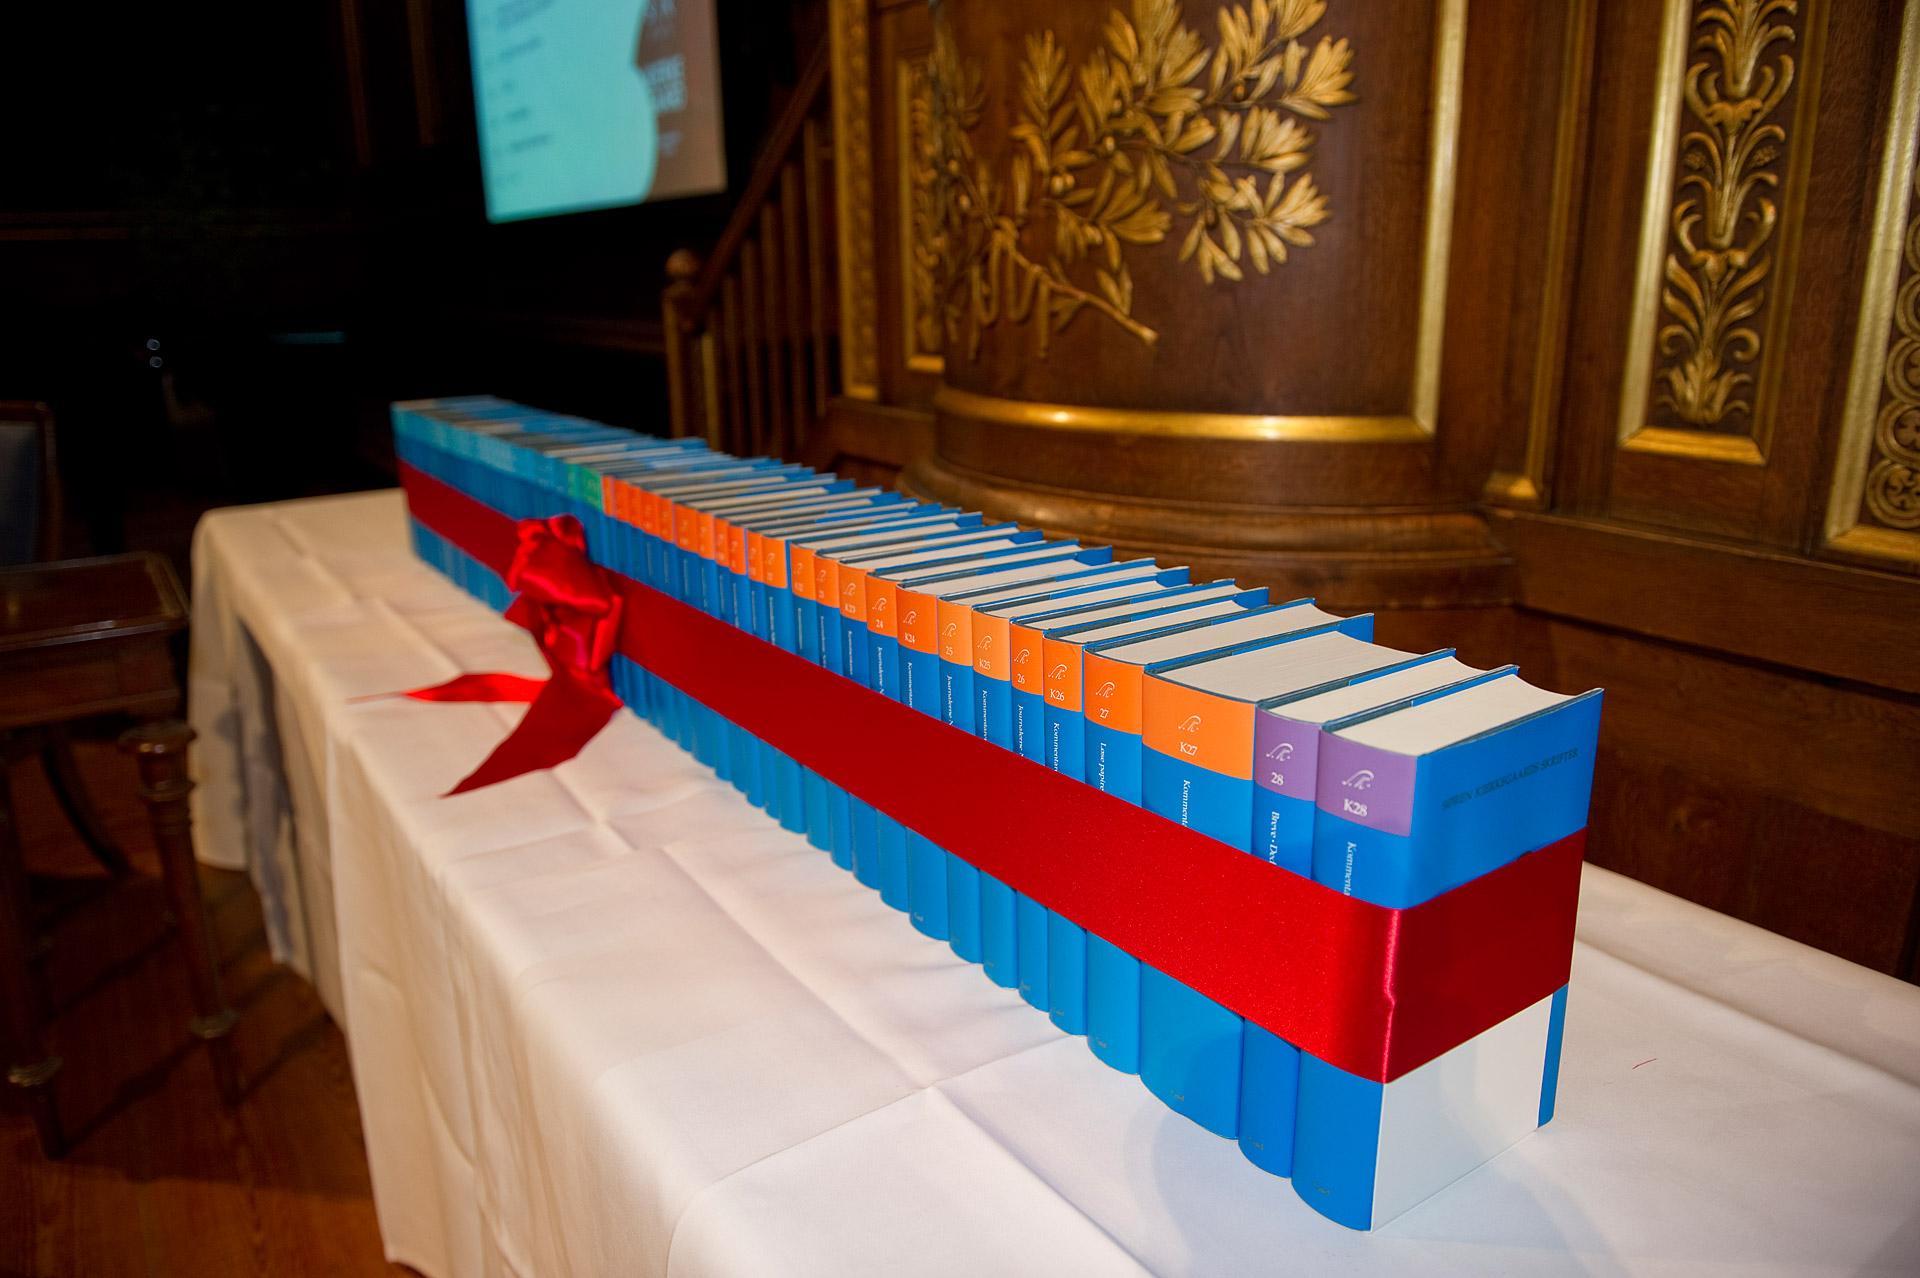 Books at a Kierkegaard Symposium in Copenhagen University